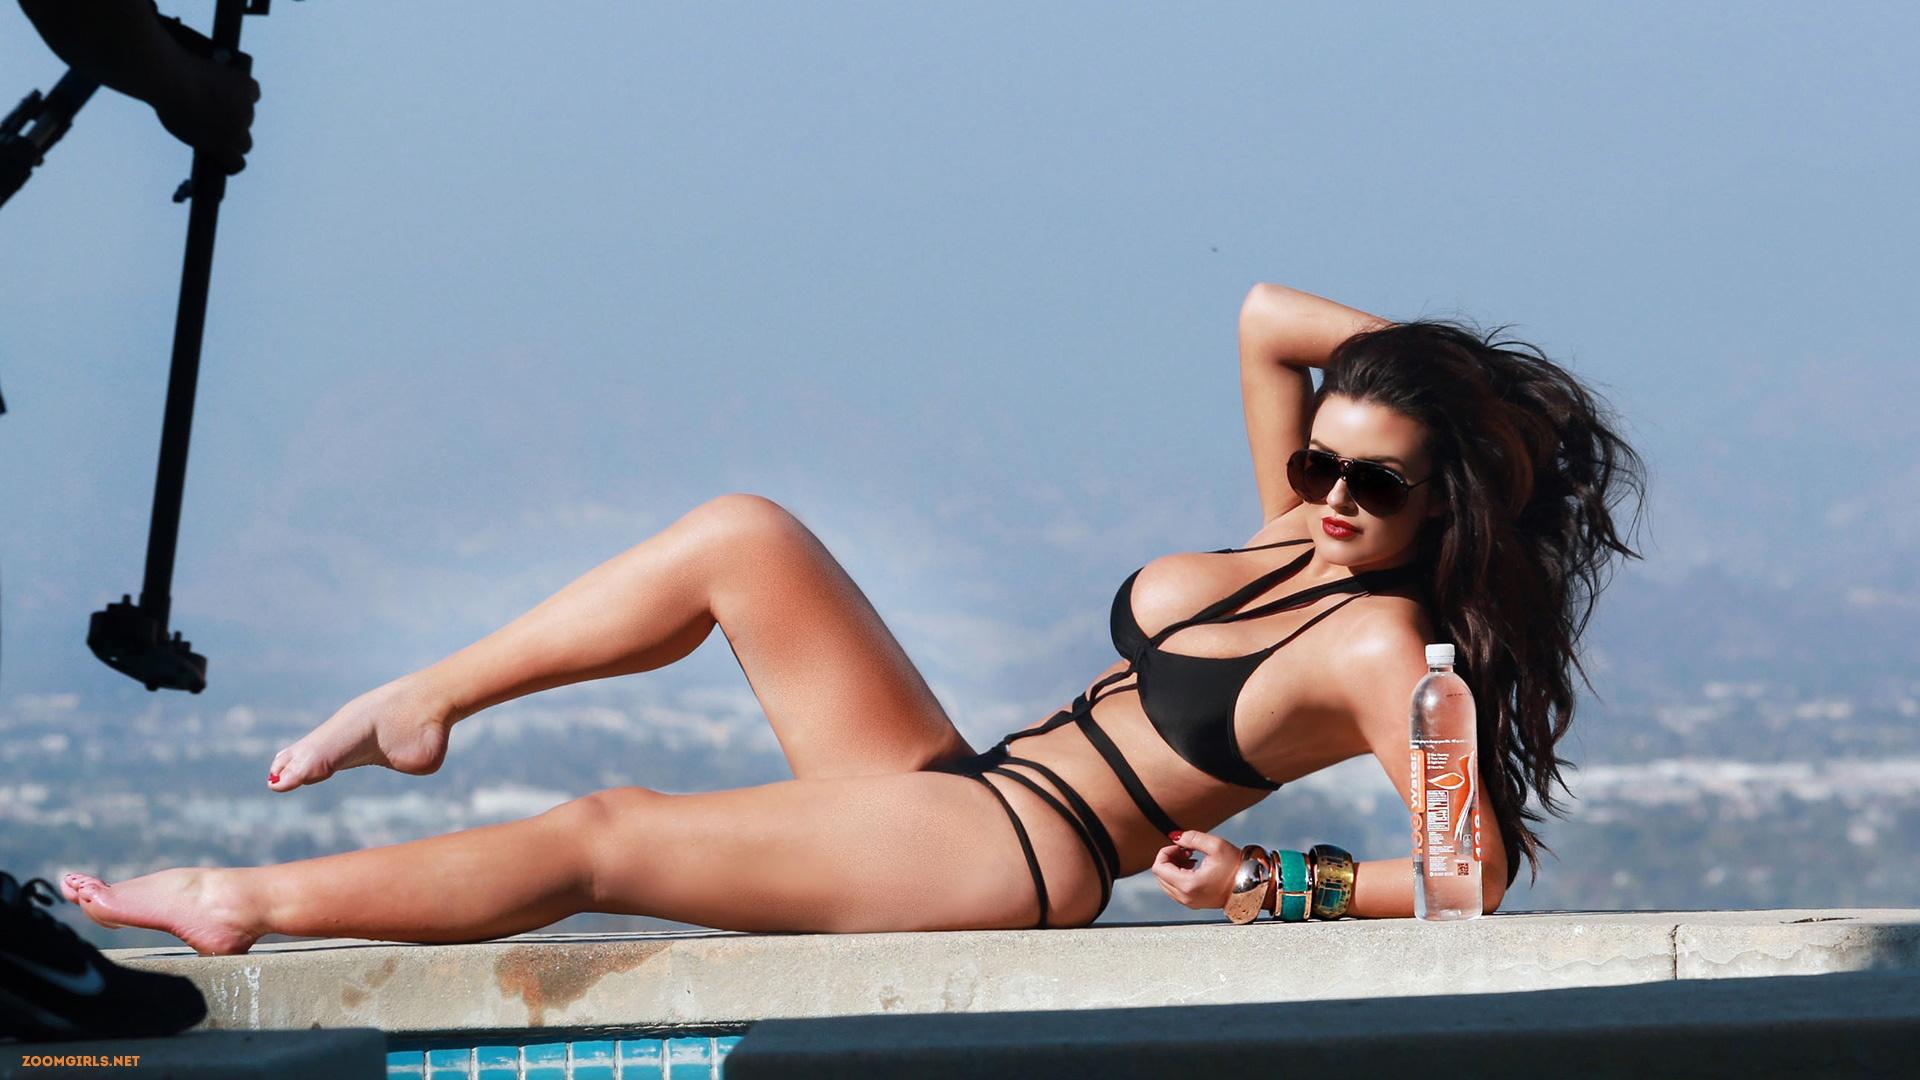 abigail ratchford hot busty brunette modelthe pool showing her